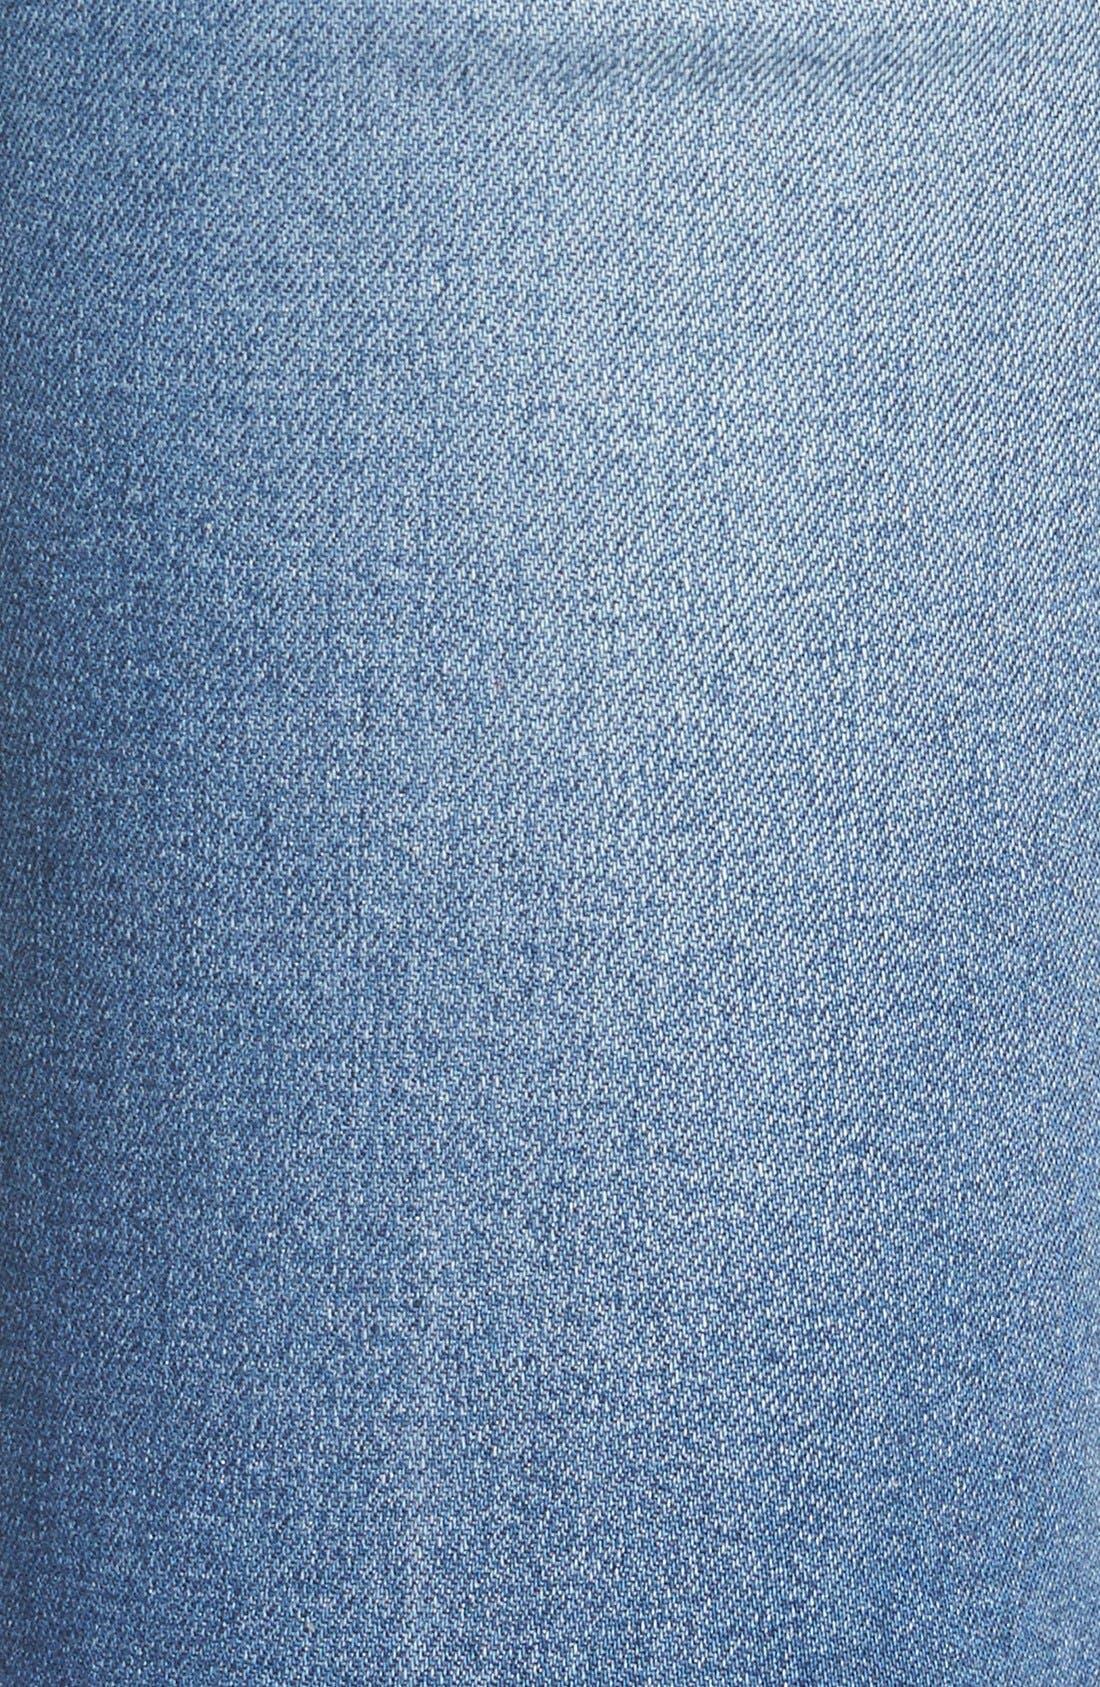 'Flea Market' Flare Jeans,                             Alternate thumbnail 5, color,                             Maribel